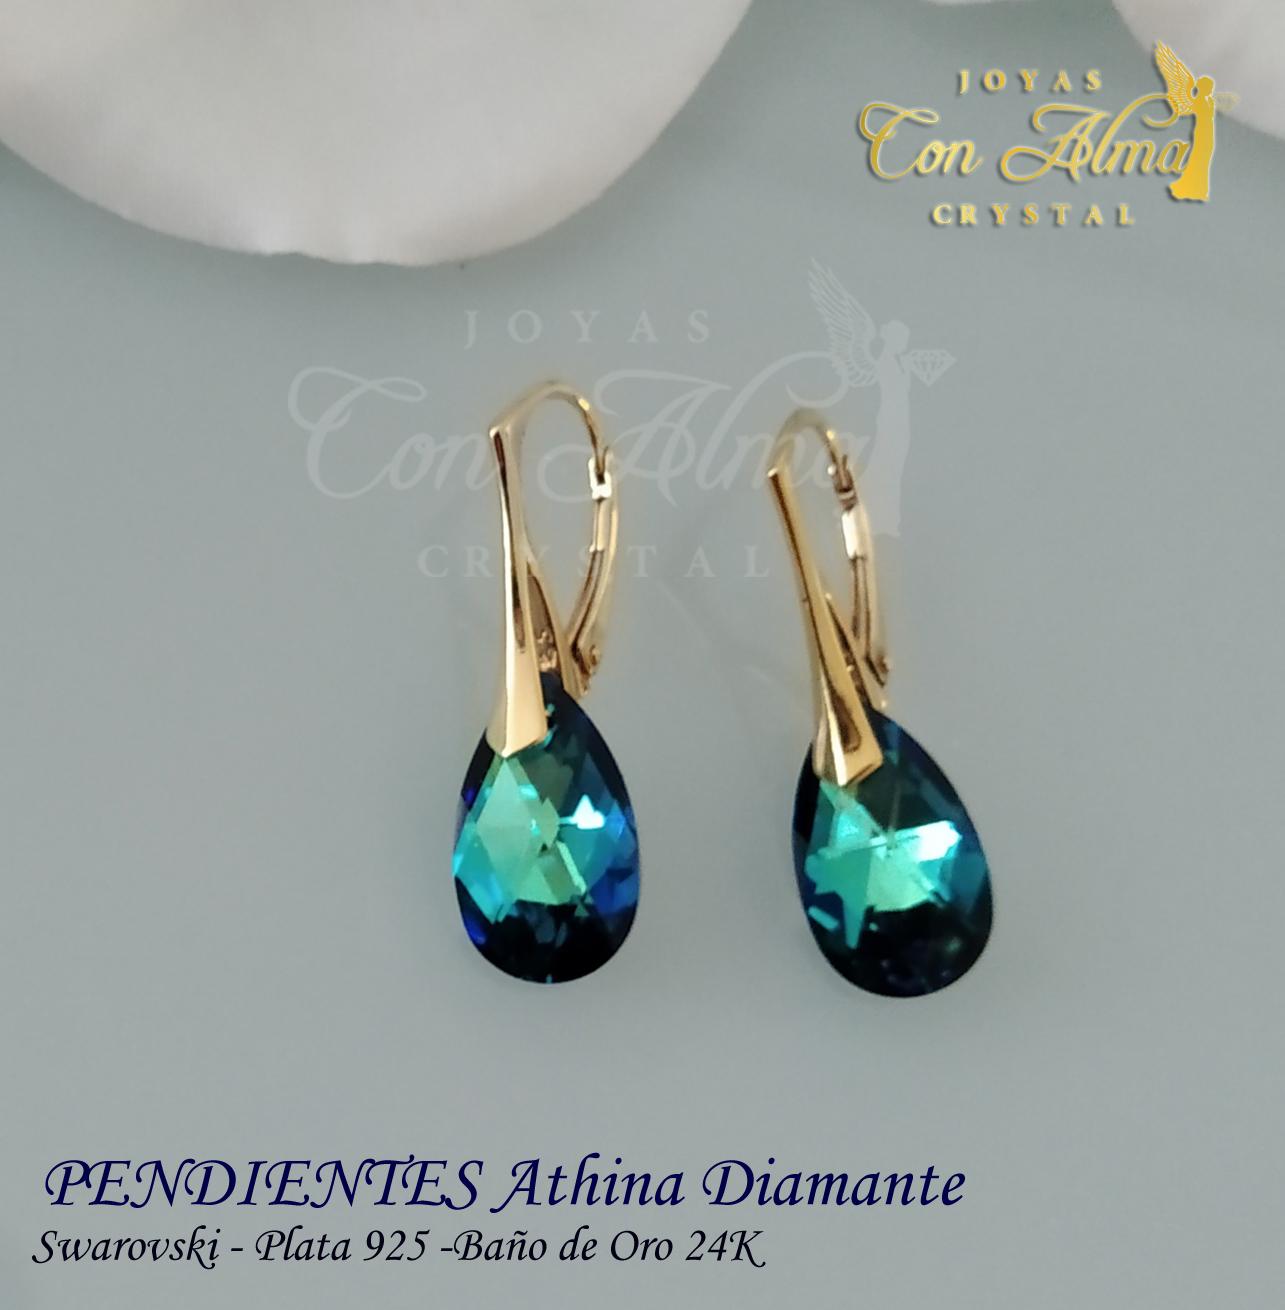 Pendientes Athina Diamante 35 €